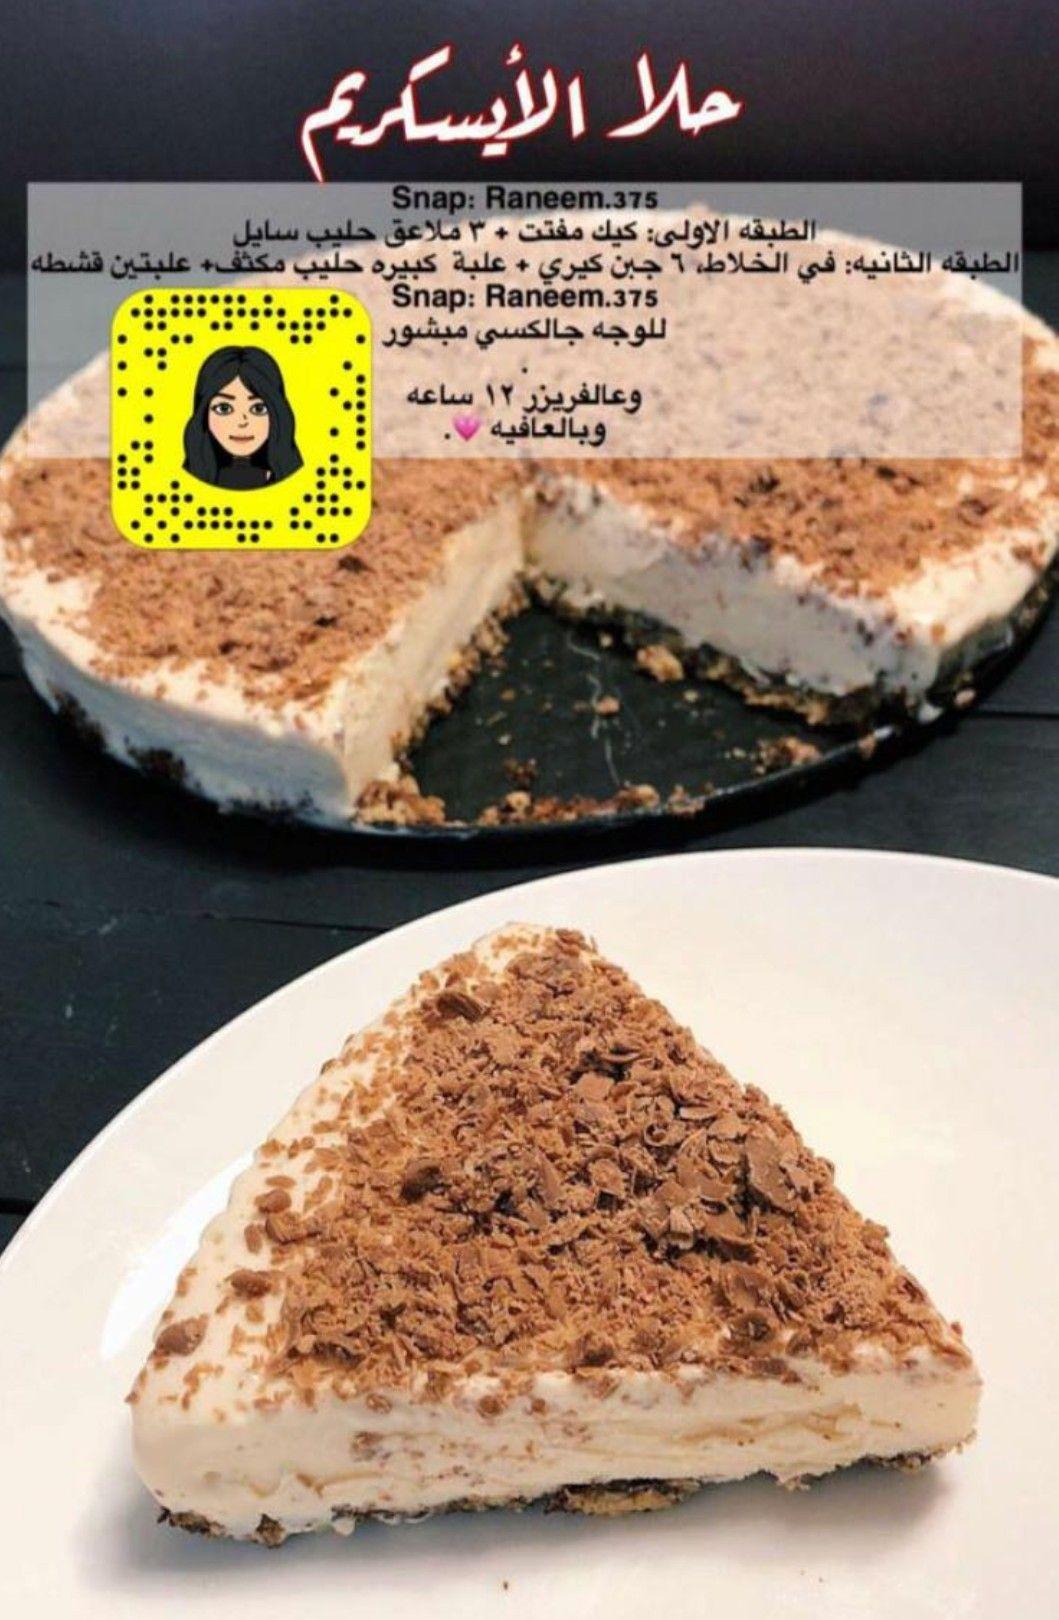 Pin By Mostafa Magdy On حلويات Food Drinks Dessert Yummy Food Dessert Food Videos Desserts